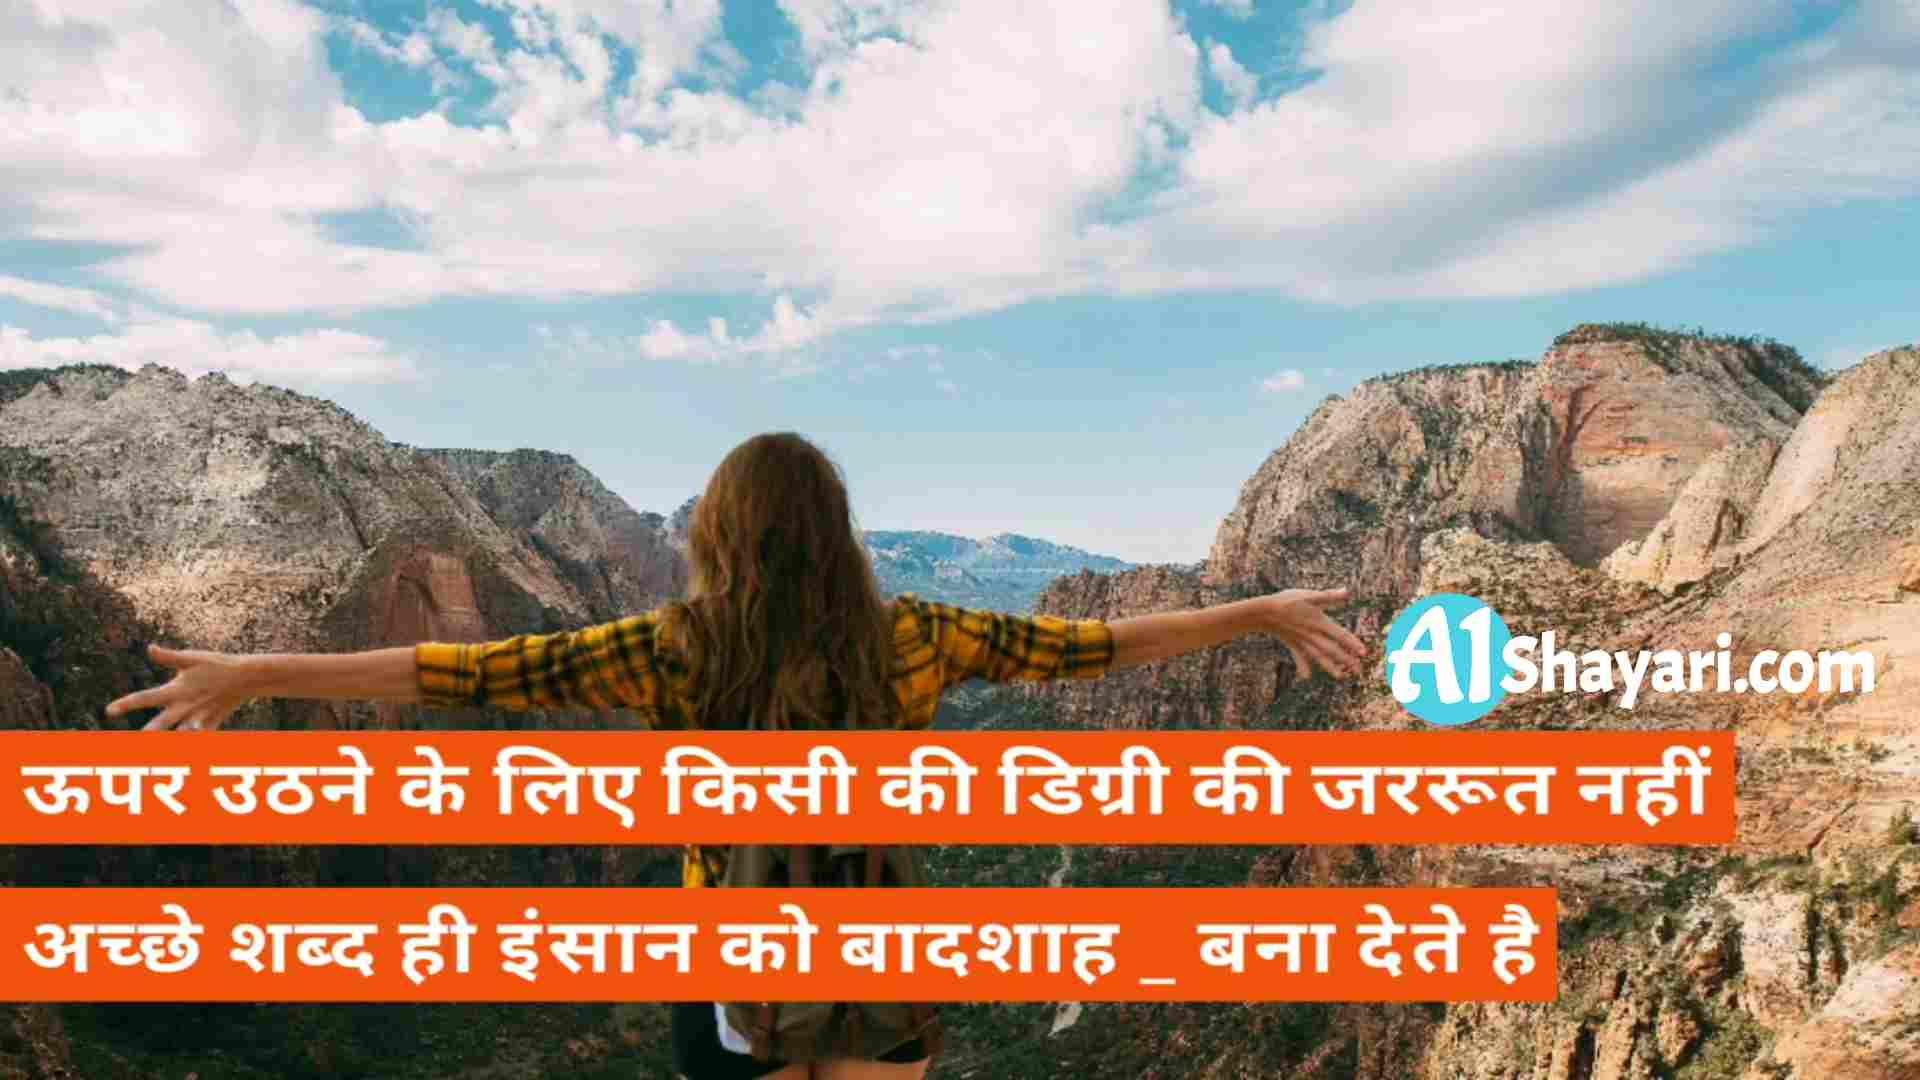 Ache Vichar In Hindi Facebook